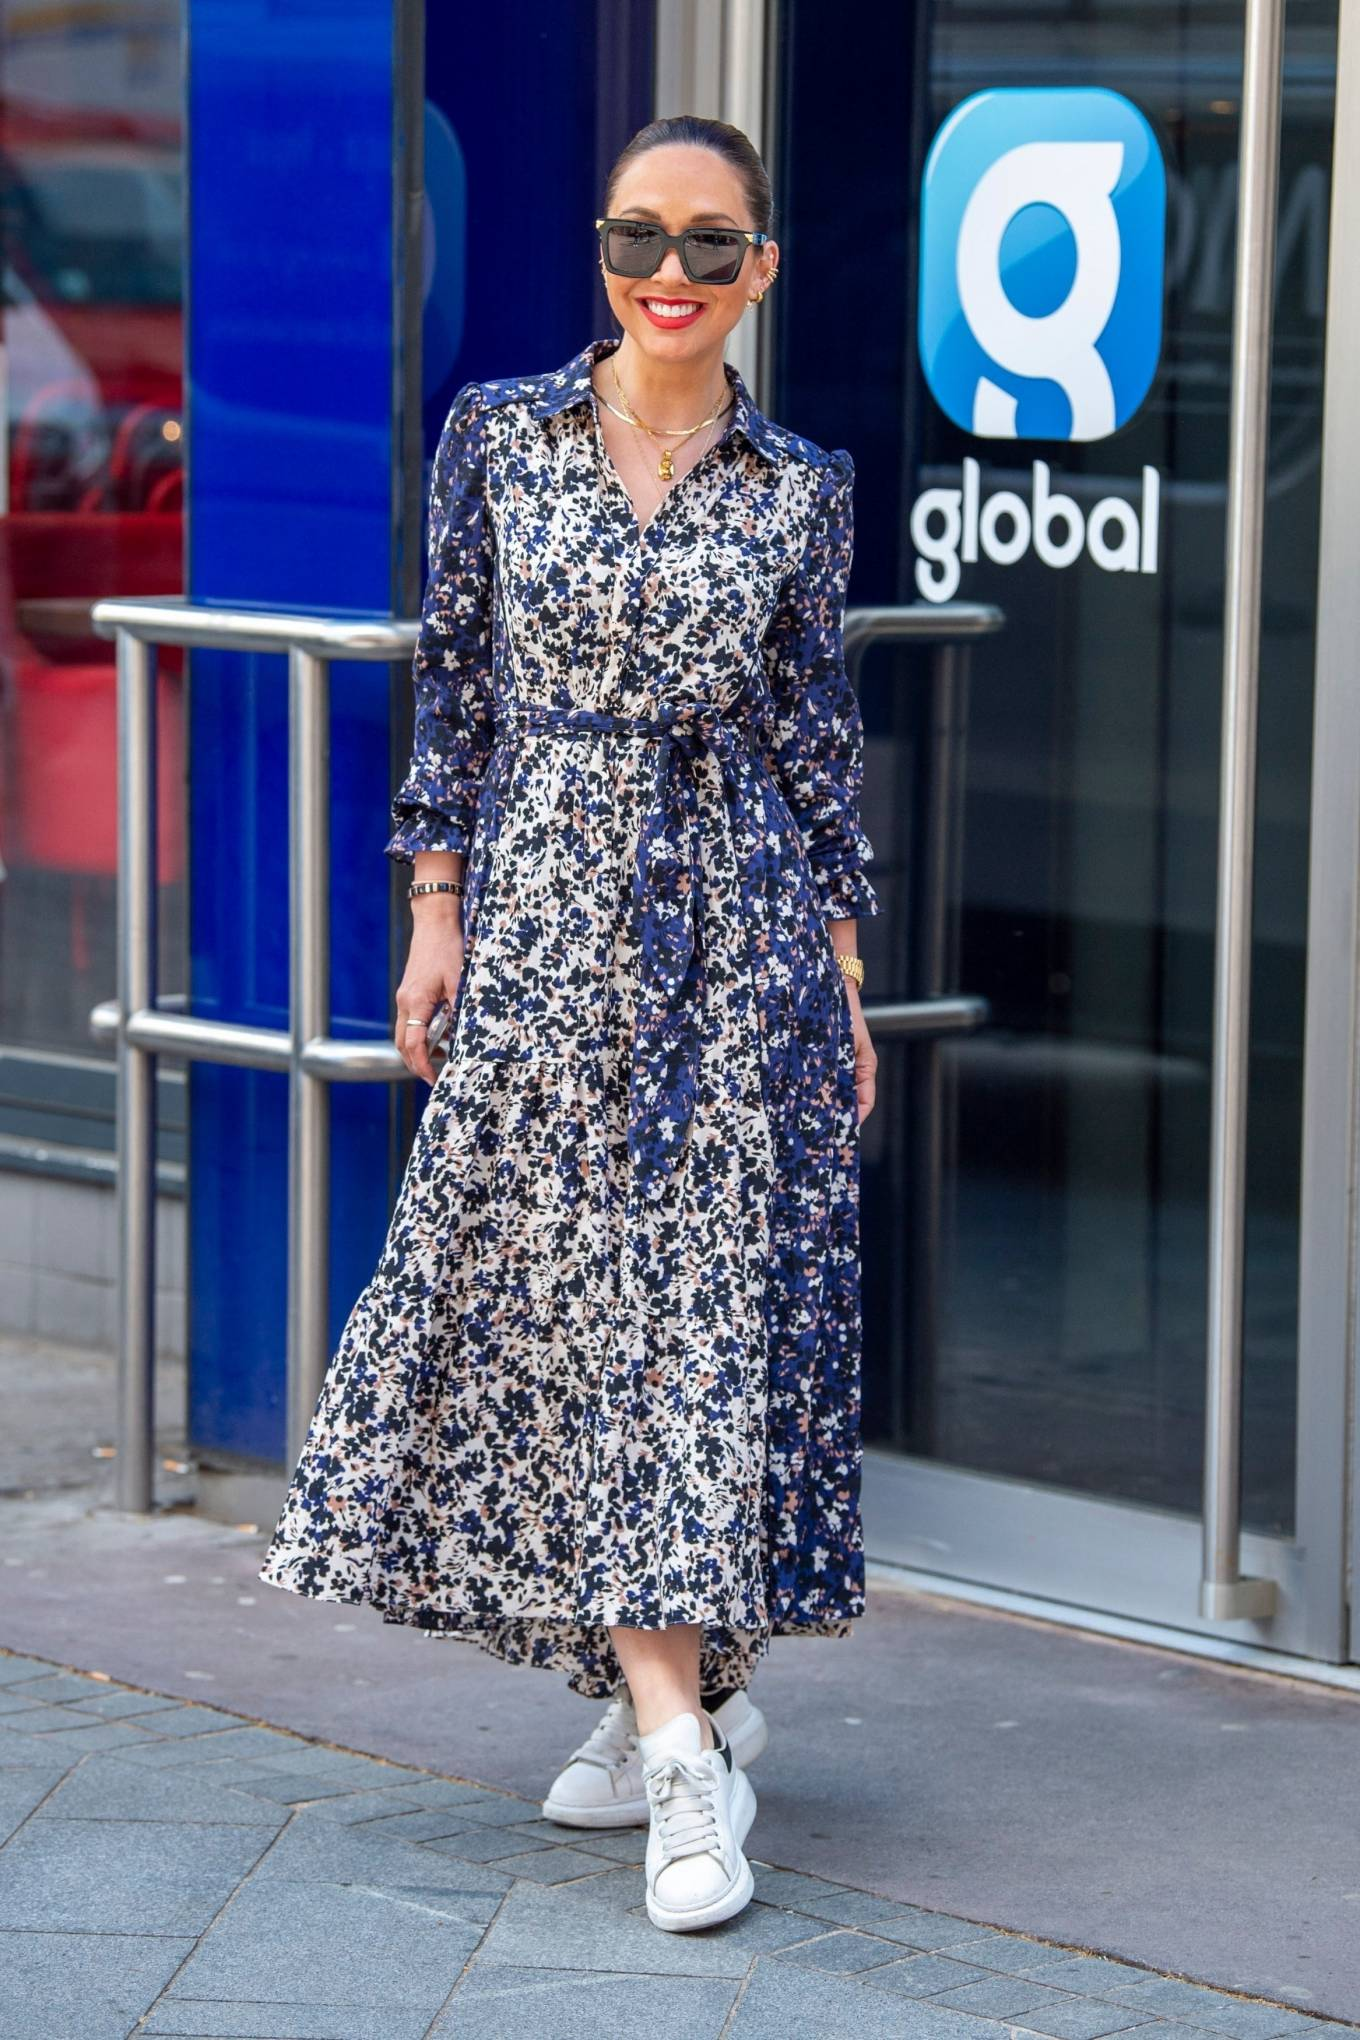 Myleene Klass 2021 : Myleene Klass – In a long summer dress arriving at the Global studios -01